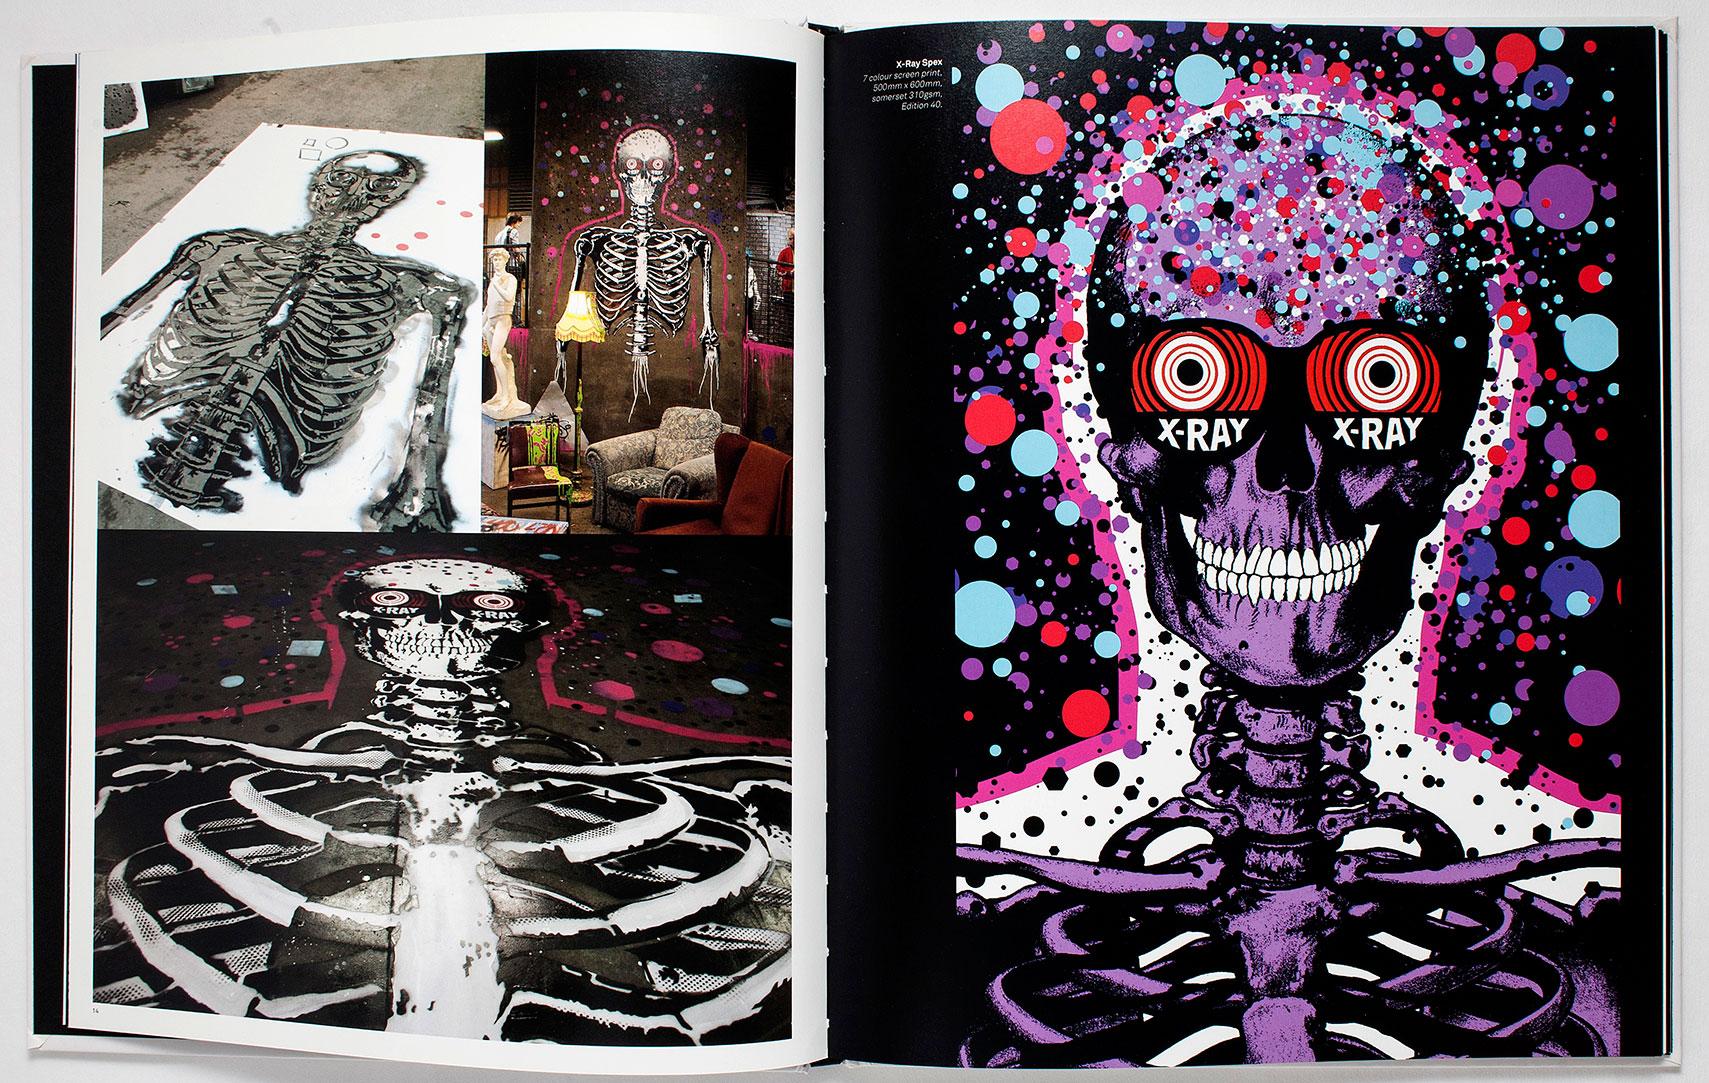 epm-print-management-art-books-paul-insect-3.jpg